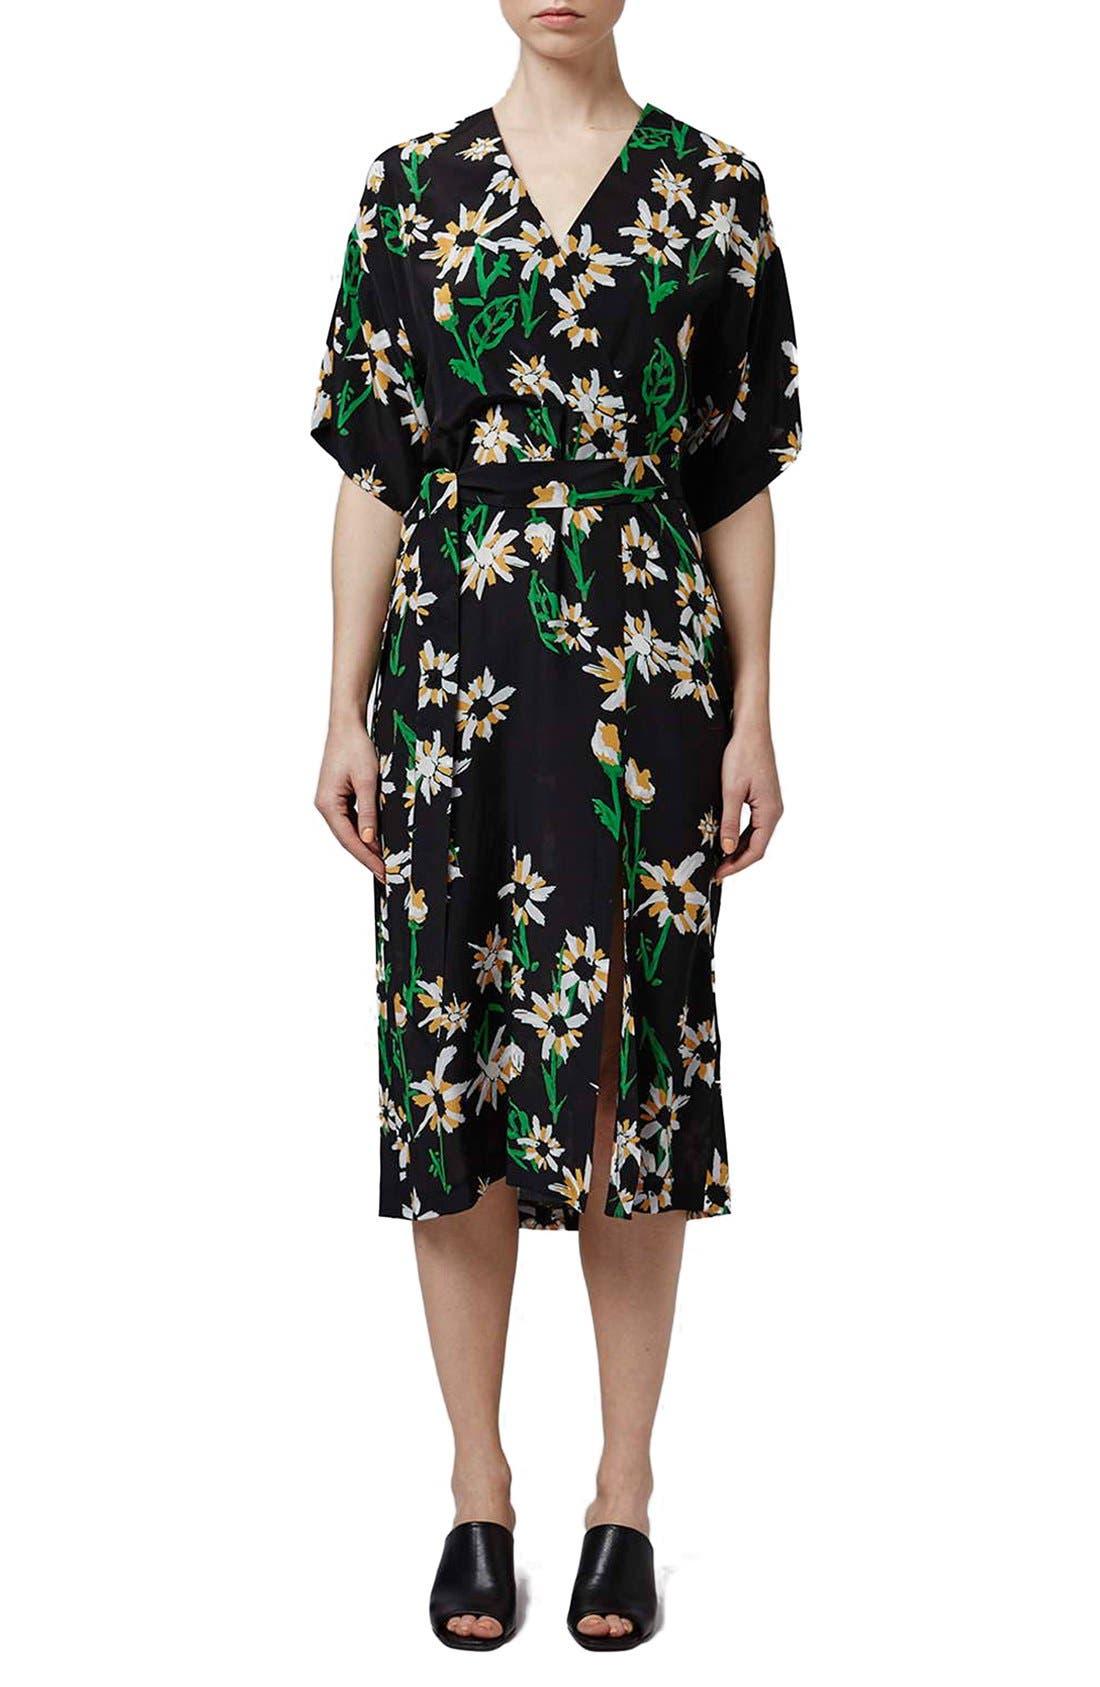 TOPSHOP BOUTIQUE, Daisy Print Silk Kimono Dress, Main thumbnail 1, color, 001